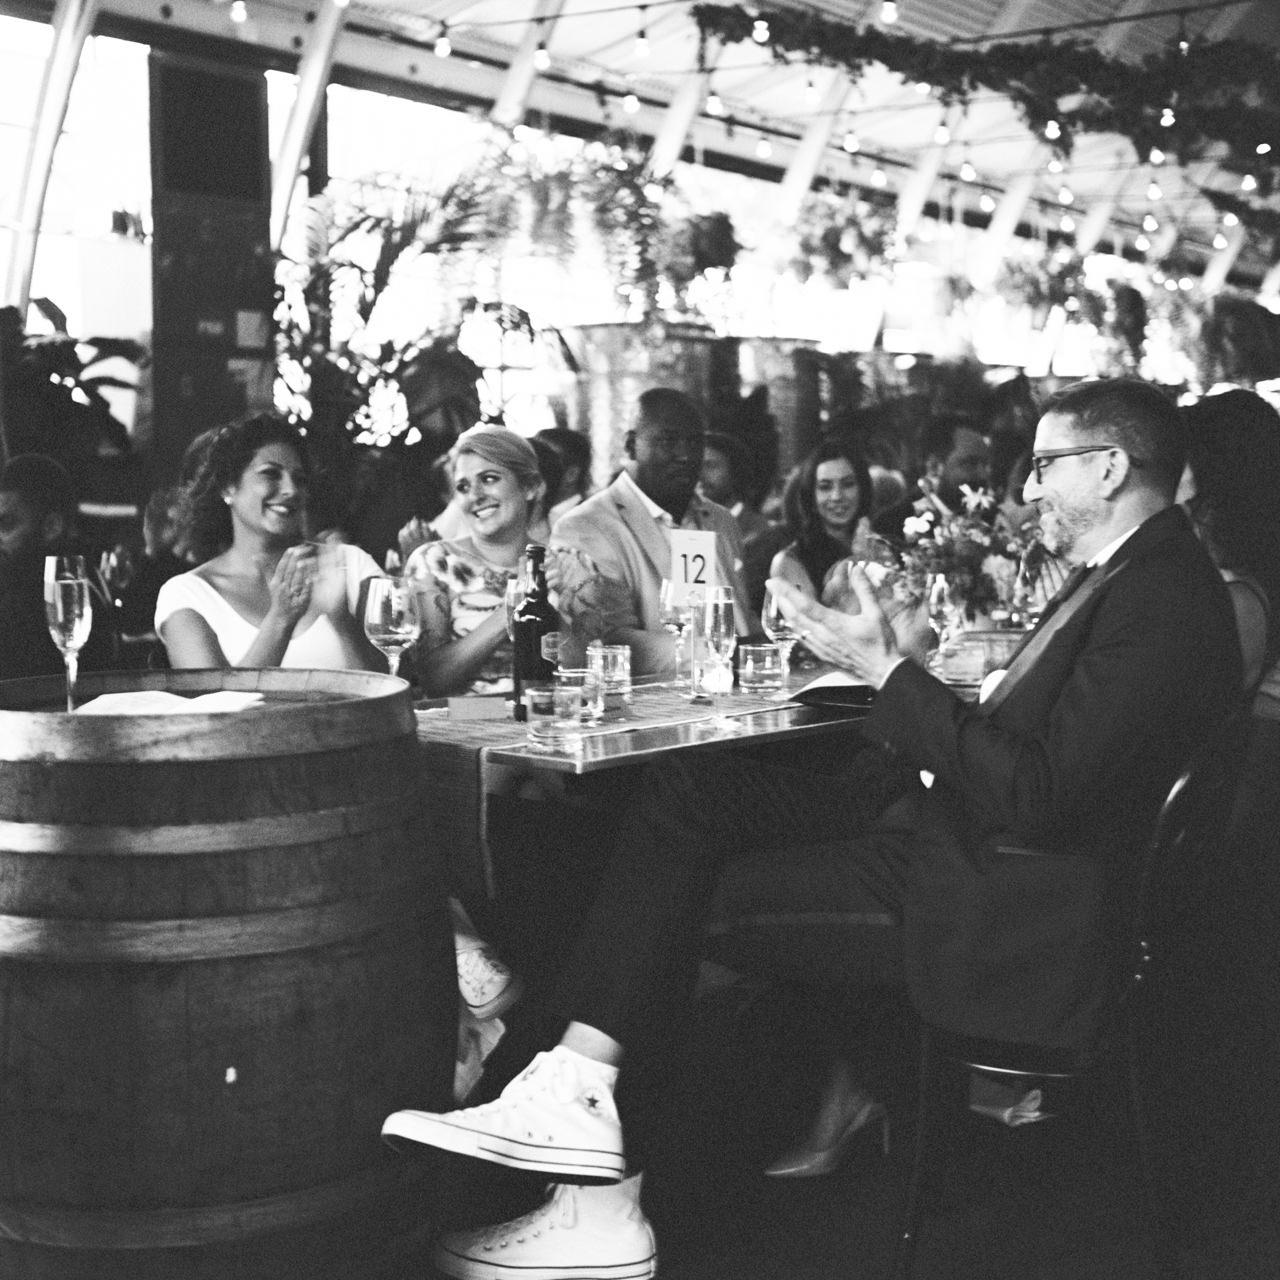 coopers-hall-portland-oregon-wedding-102a.jpg